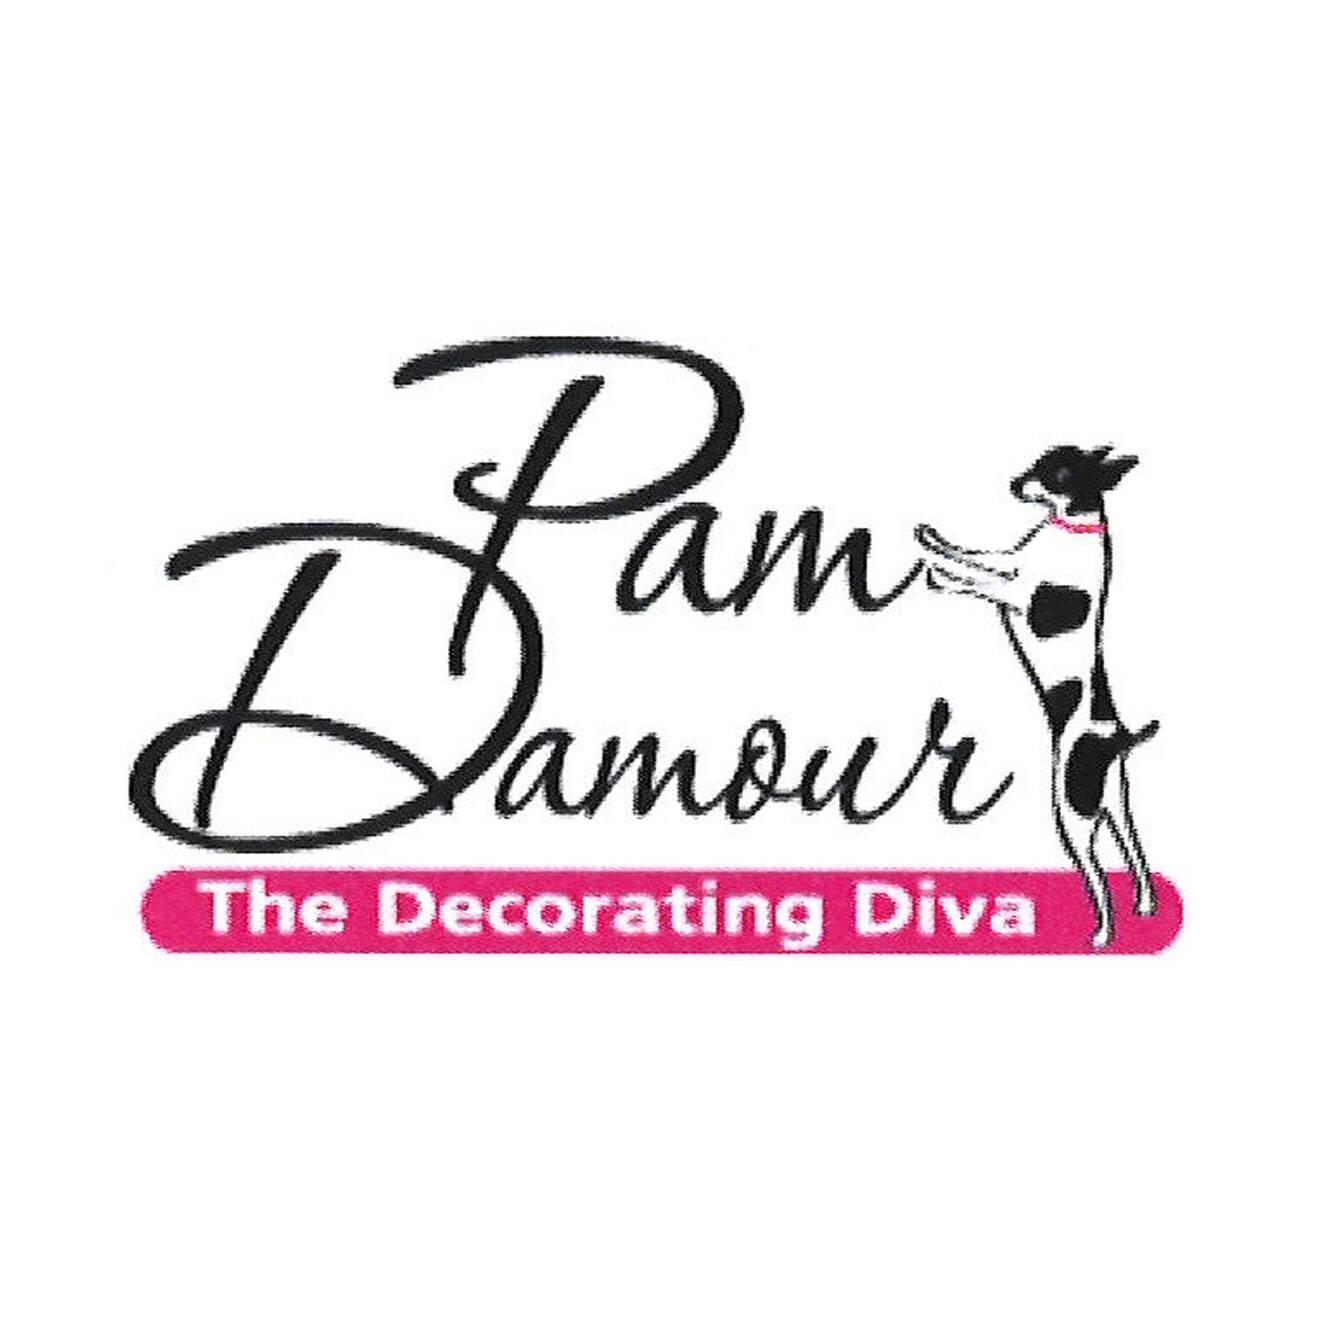 Pam Damour Designs